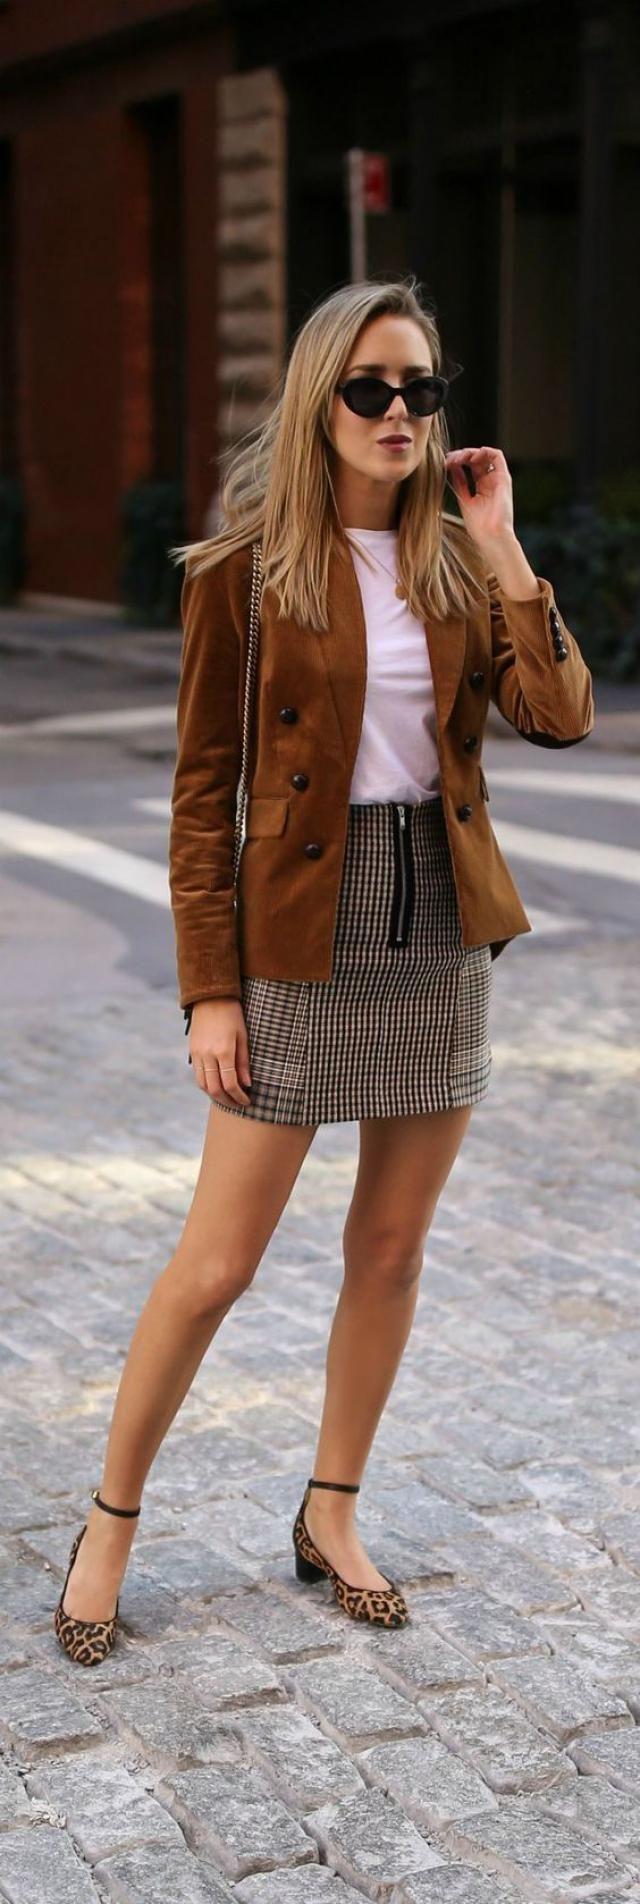 Jacket Brown And Mini Skirt